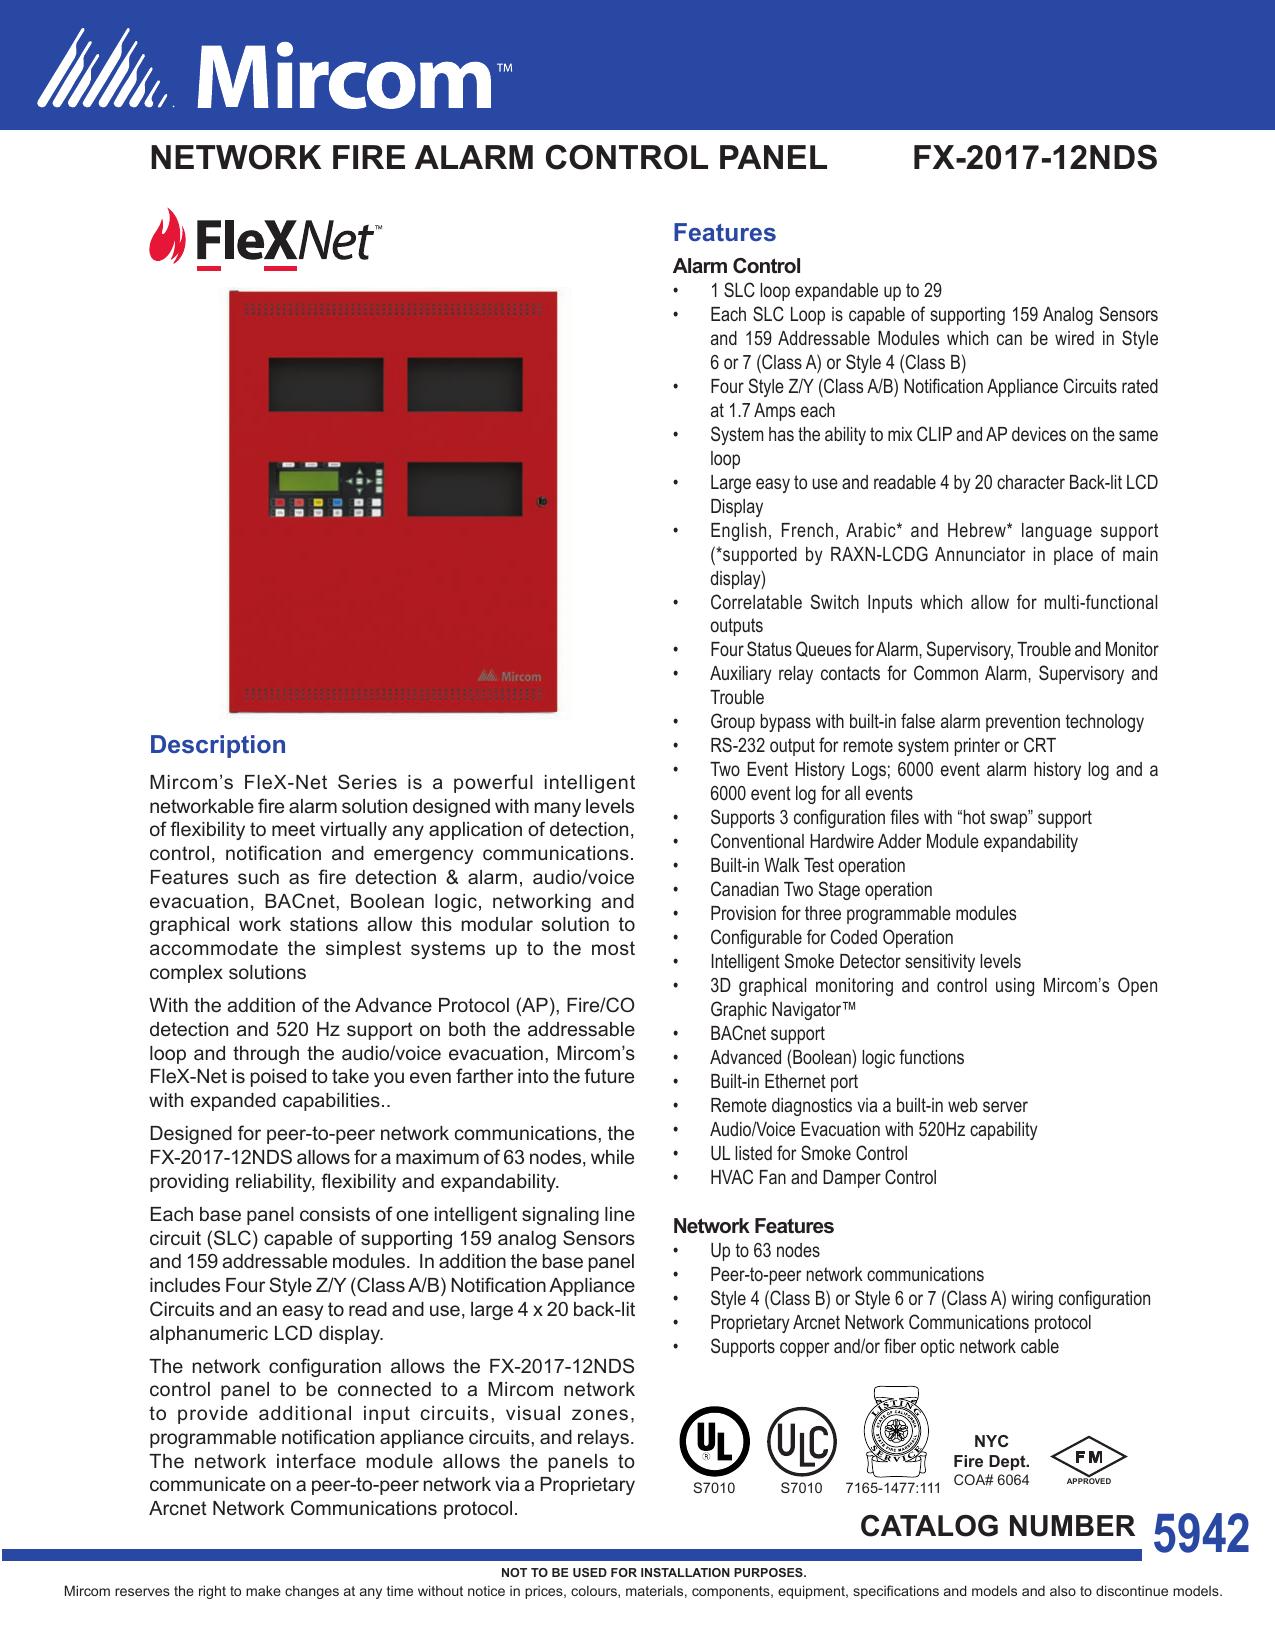 network fire alarm control panel fx-2017